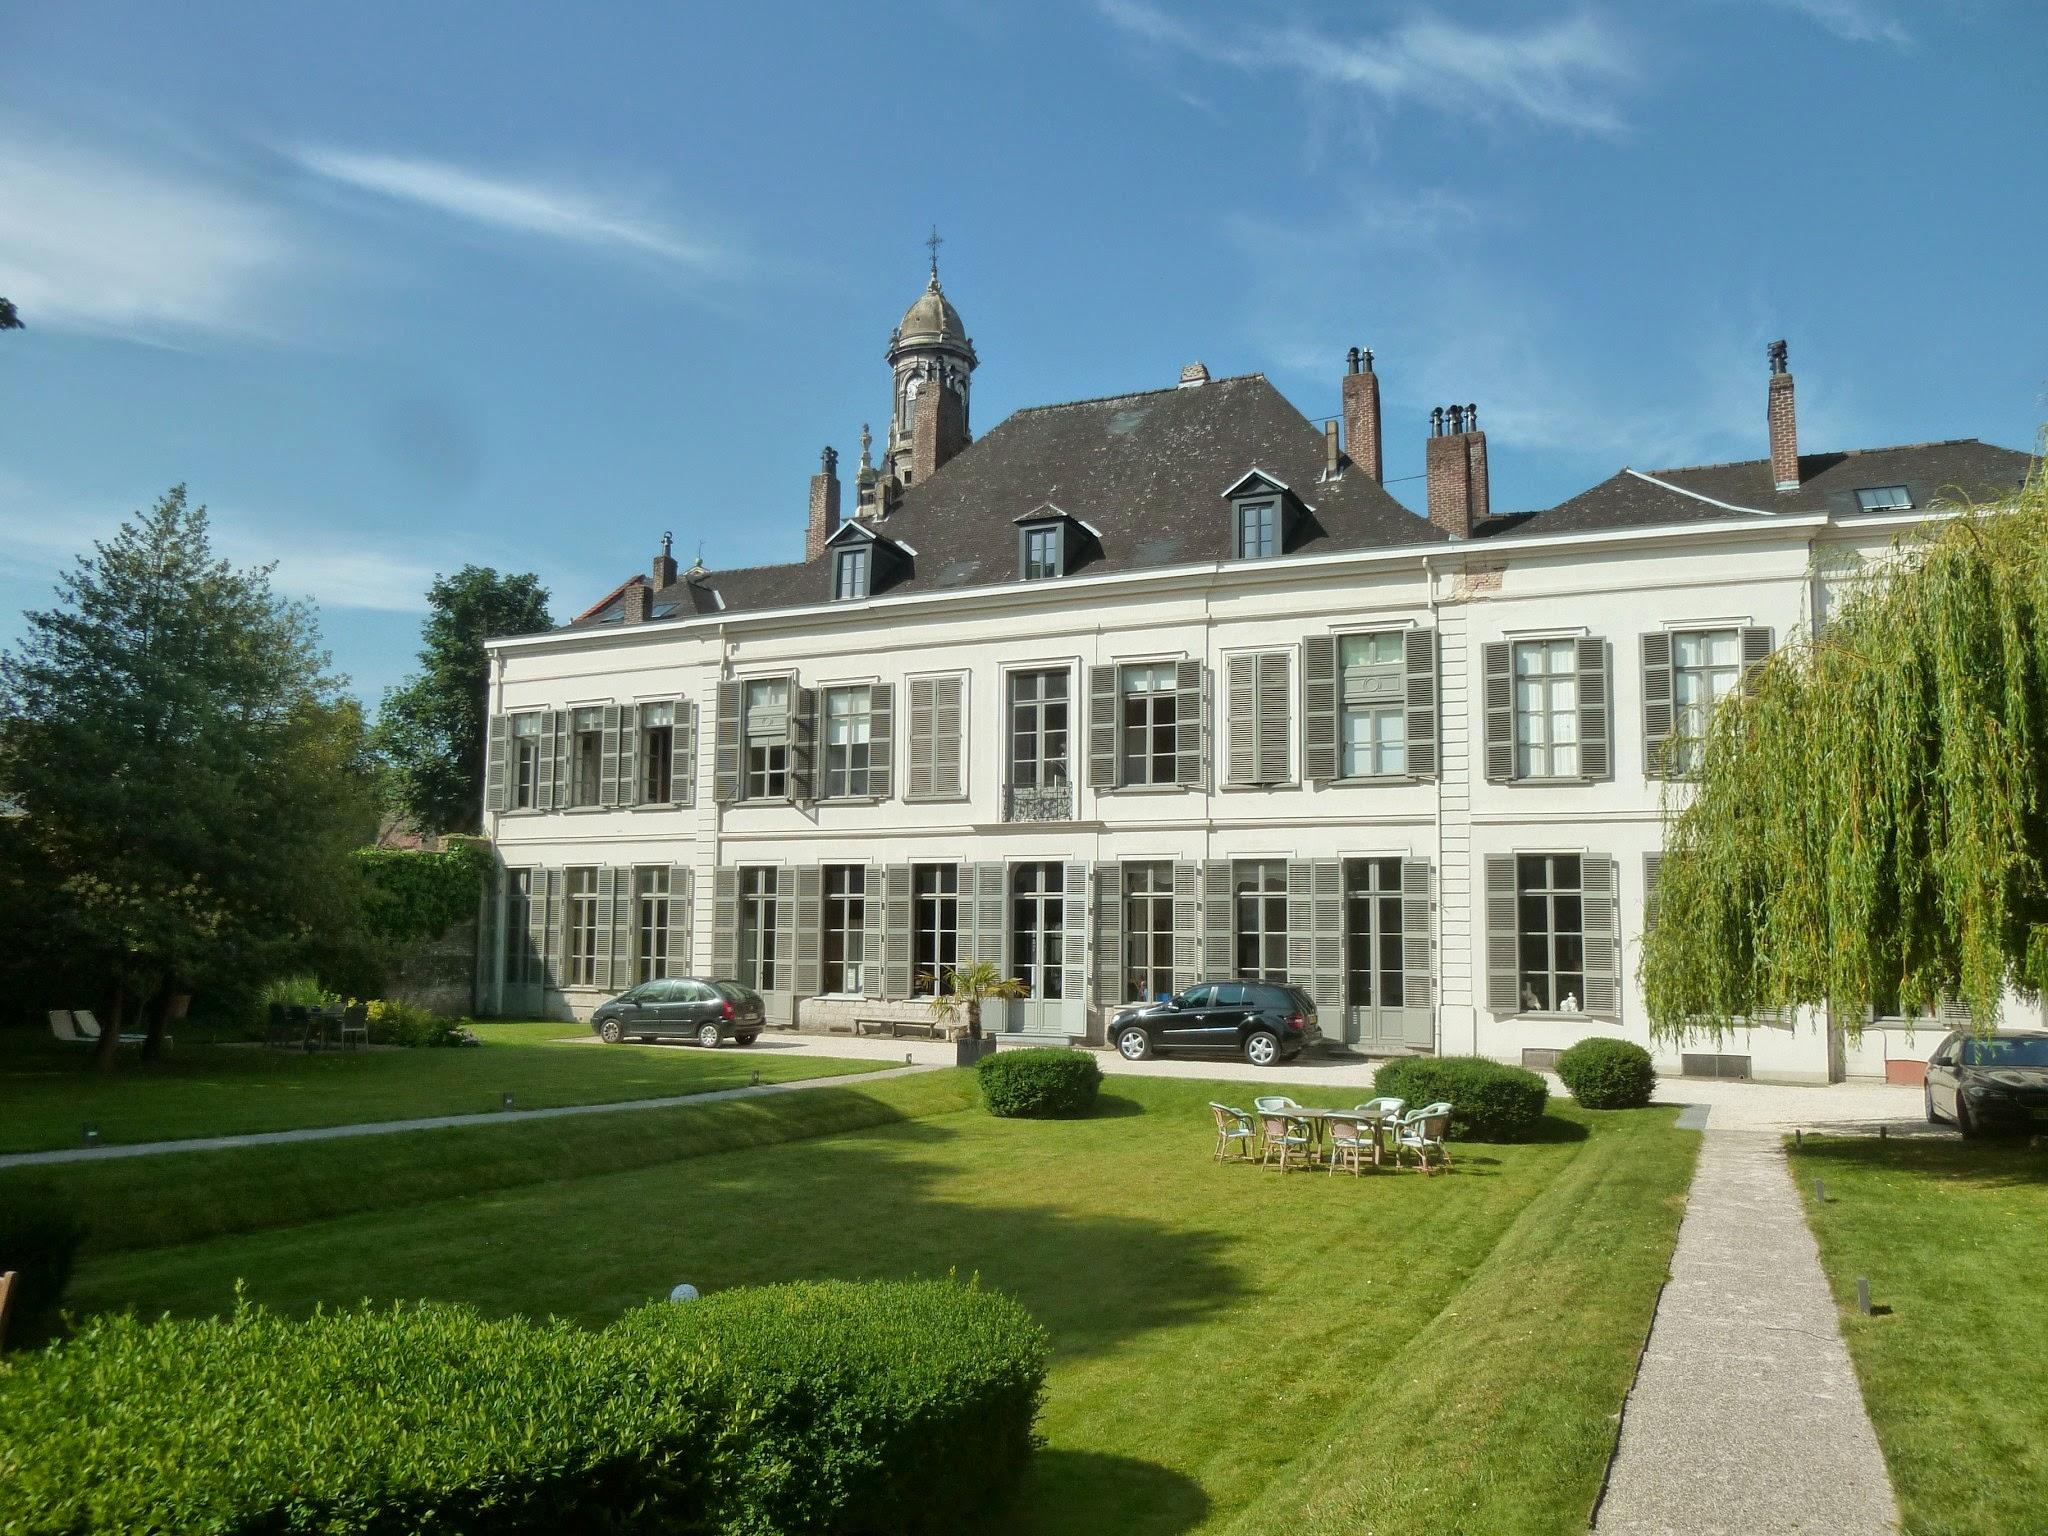 Hotel-Virnot-de-Lamissart-Lille